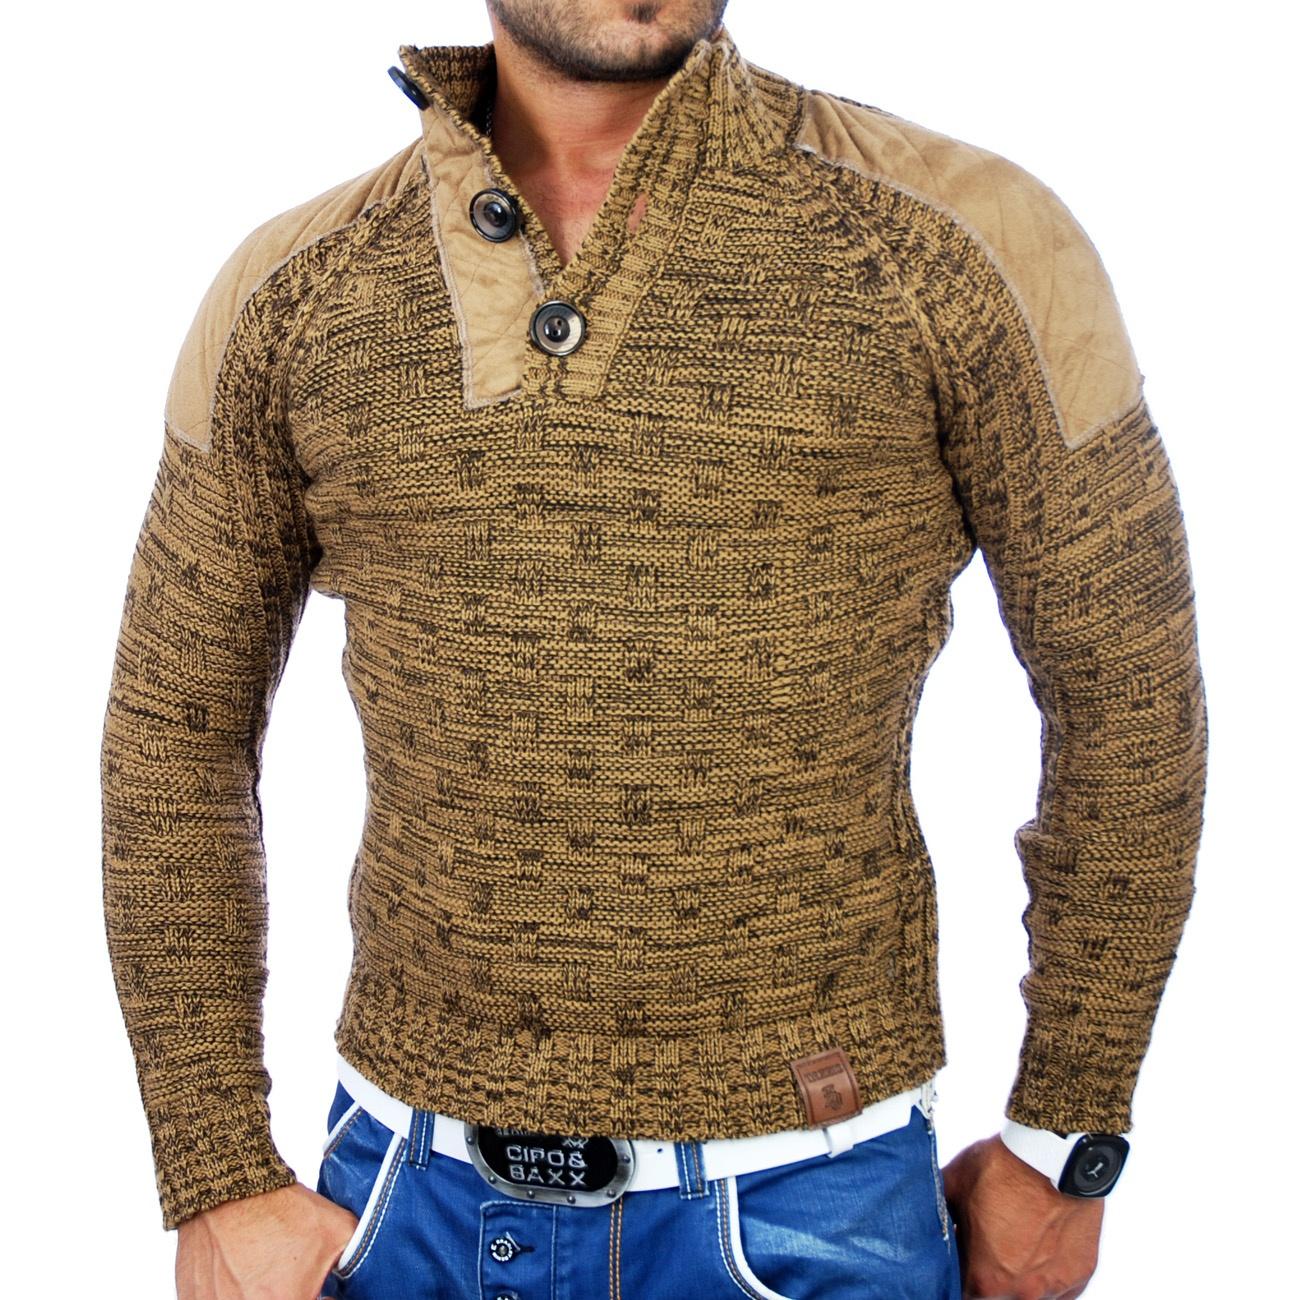 tazzio herren pullover grobstrick sweatshirt strickjacke jacke tz 3570 camel ebay. Black Bedroom Furniture Sets. Home Design Ideas